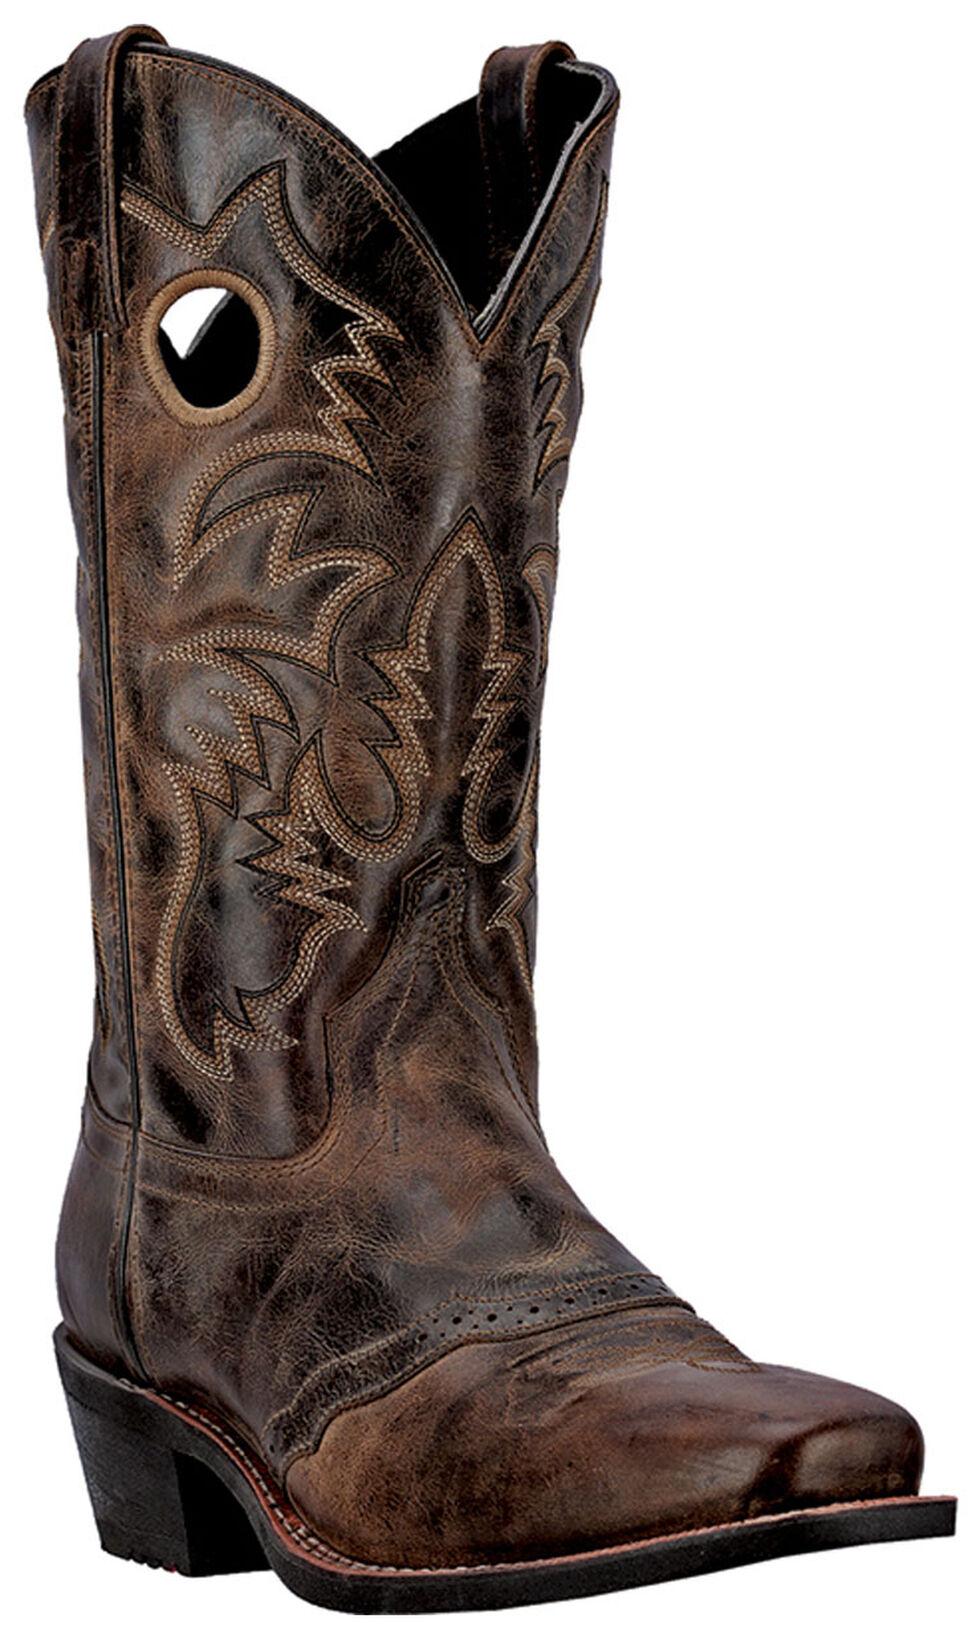 Laredo Pequin Cowboy Boots - Square Toe, Taupe, hi-res